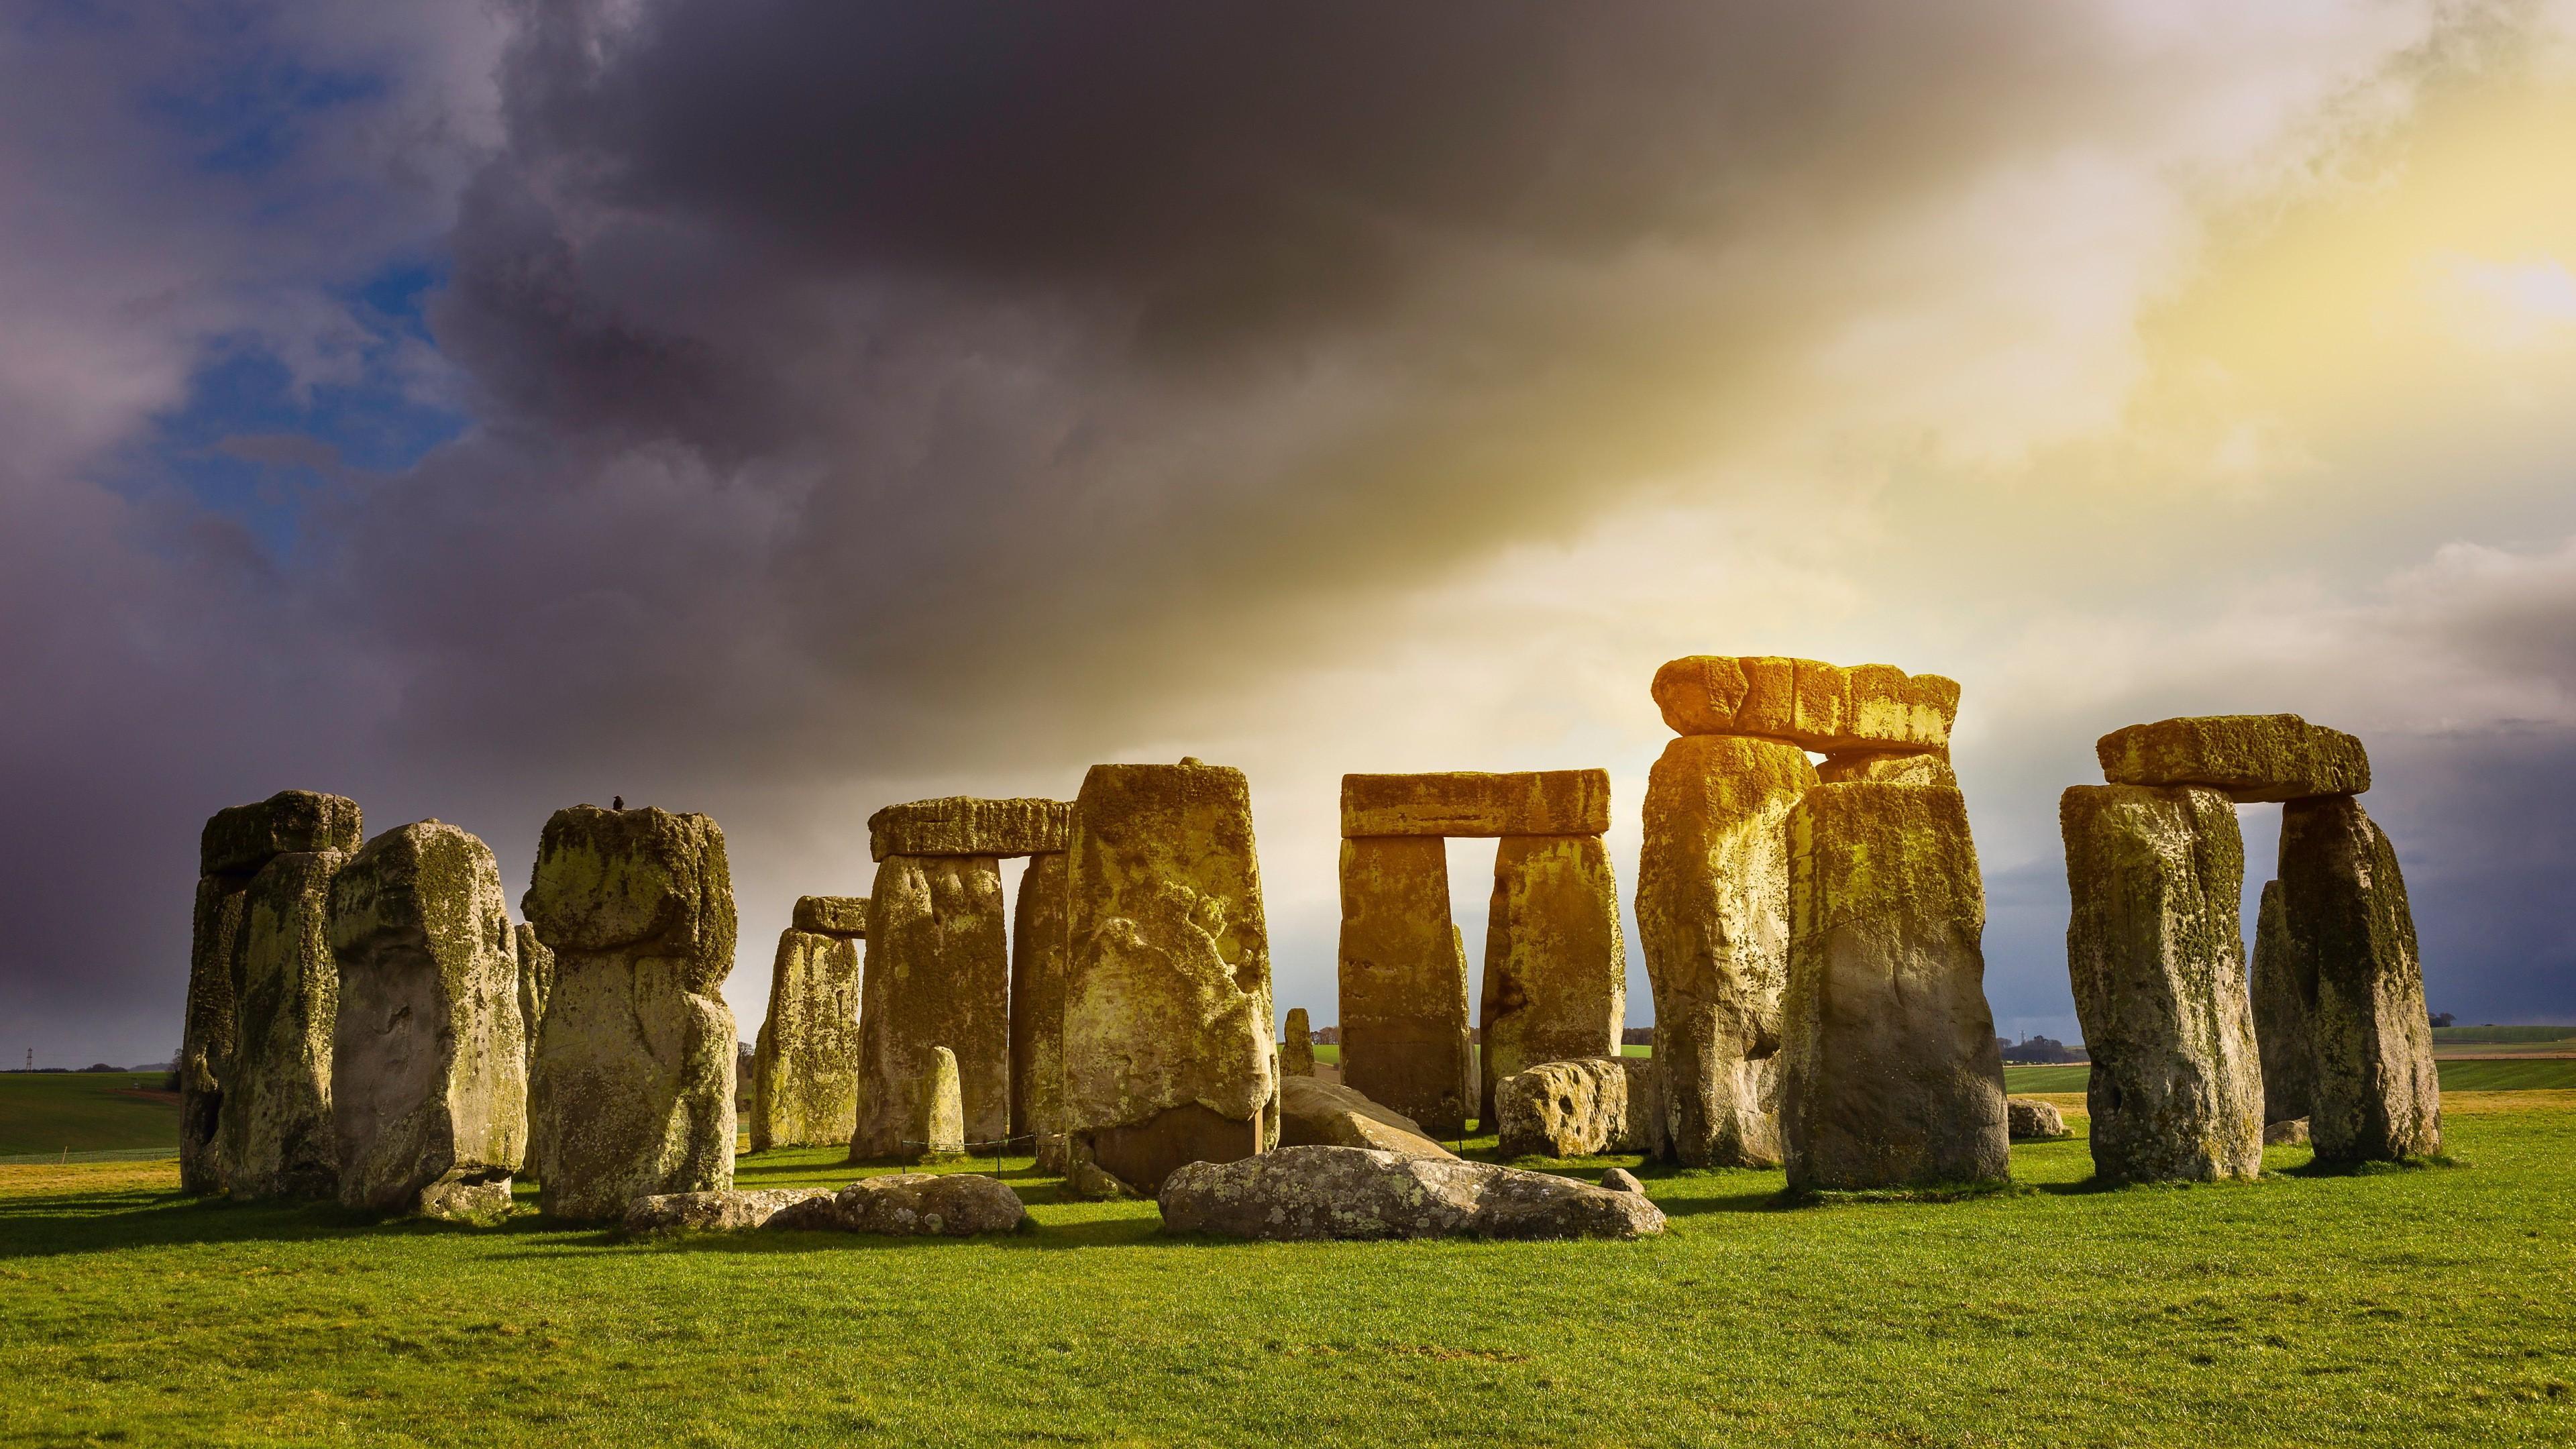 Famous Rock Group, Stonehenge, Wiltshire, England анонимно